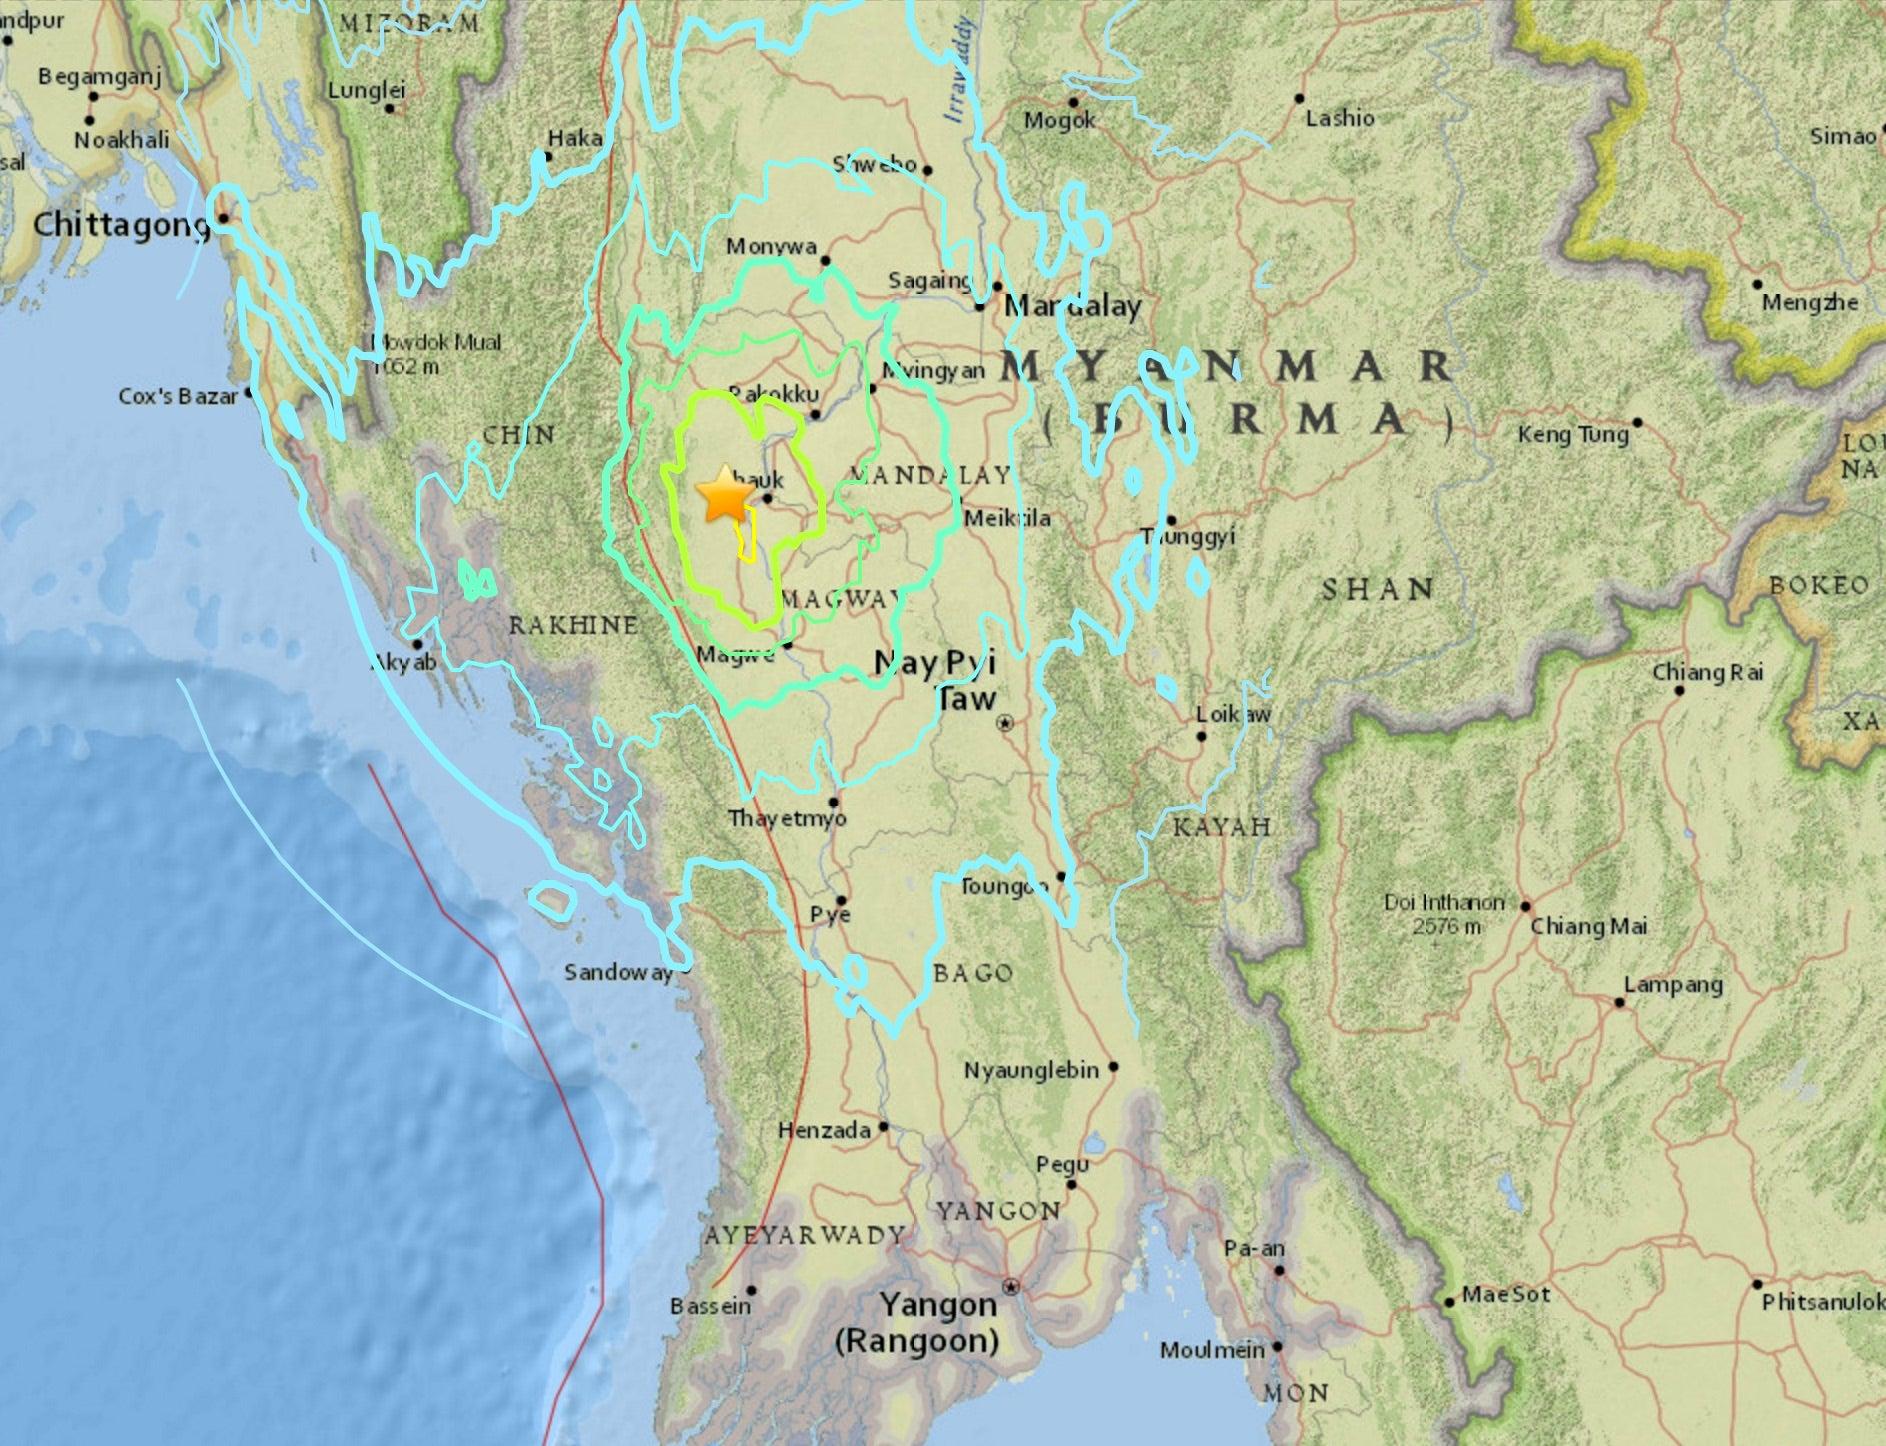 Strong 6.8 Magnitude Earthquake Strikes Myanmar